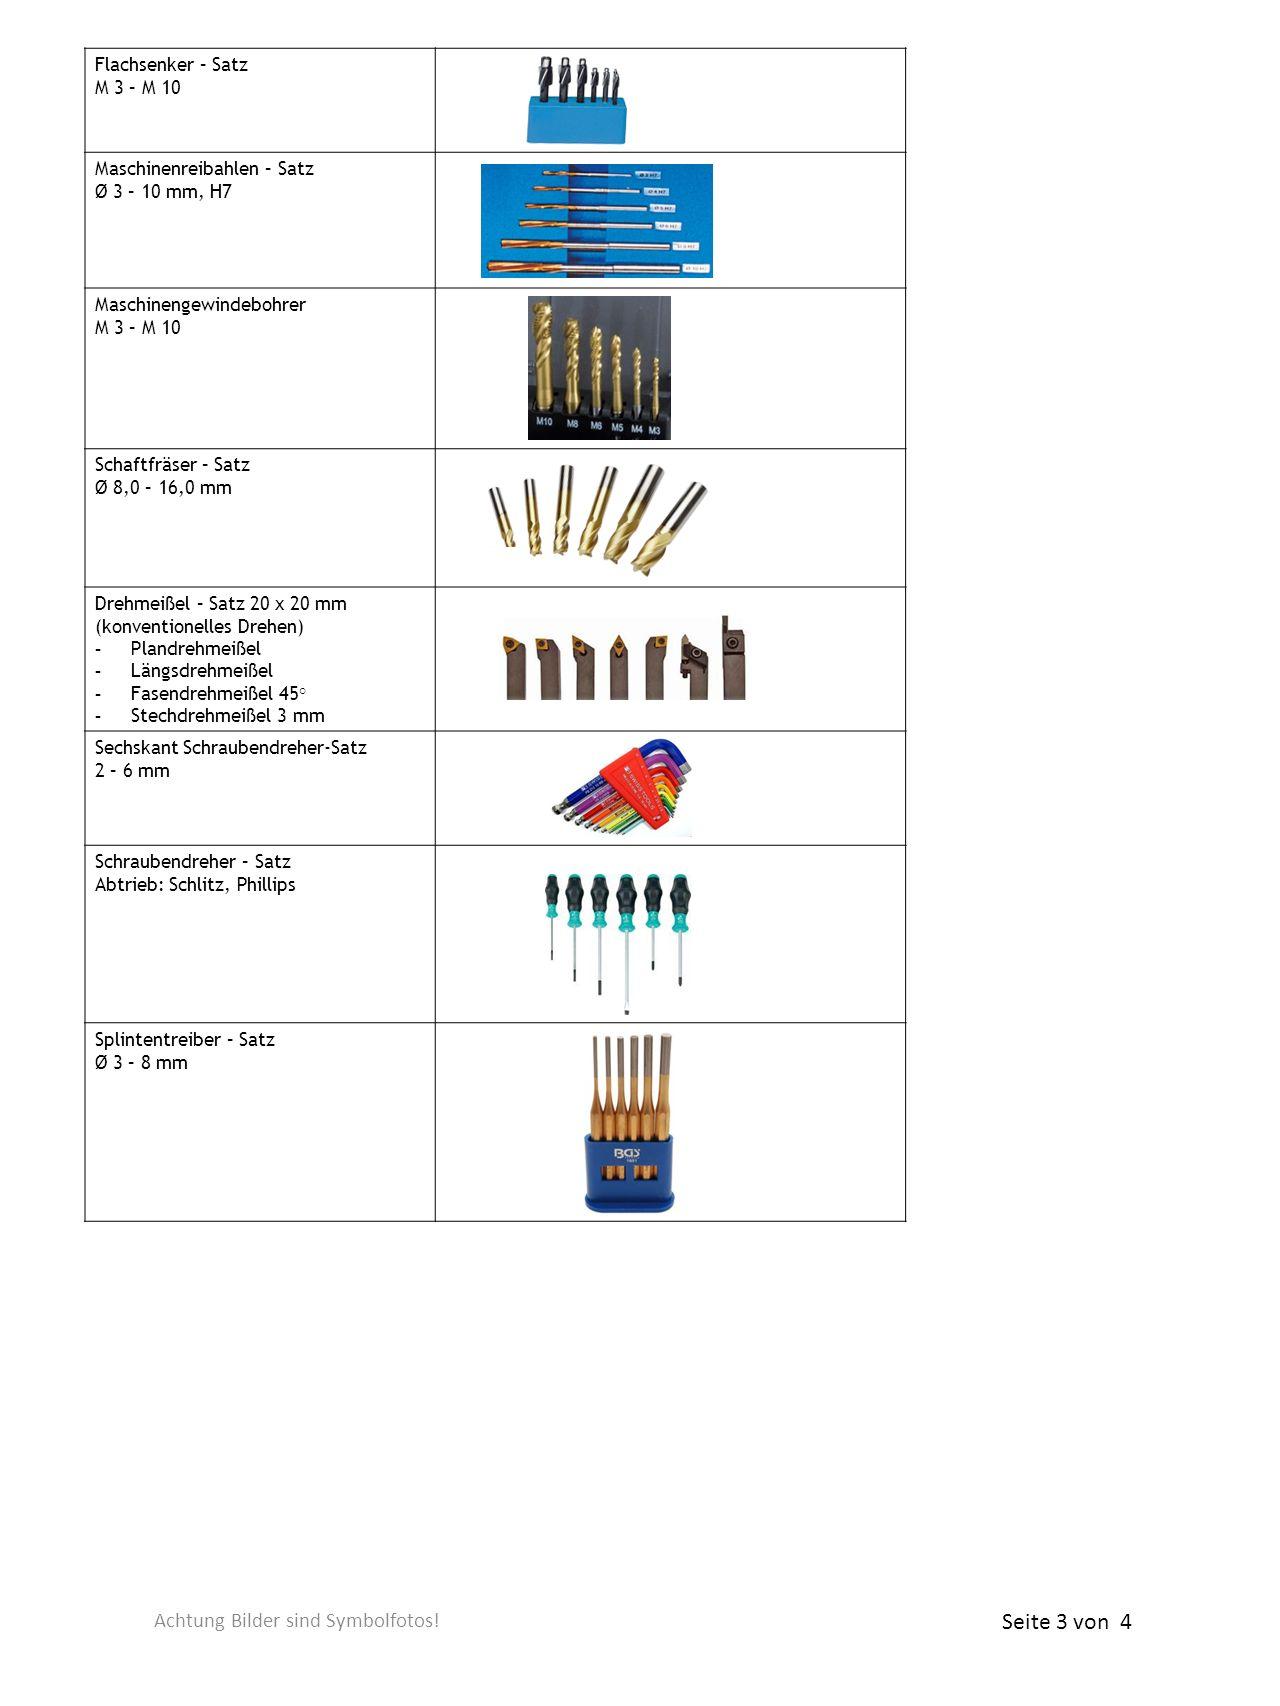 Flachsenker – Satz M 3 – M 10 Maschinenreibahlen – Satz Ø 3 – 10 mm, H7 Maschinengewindebohrer M 3 – M 10 Schaftfräser – Satz Ø 8,0 – 16,0 mm Drehmeiß